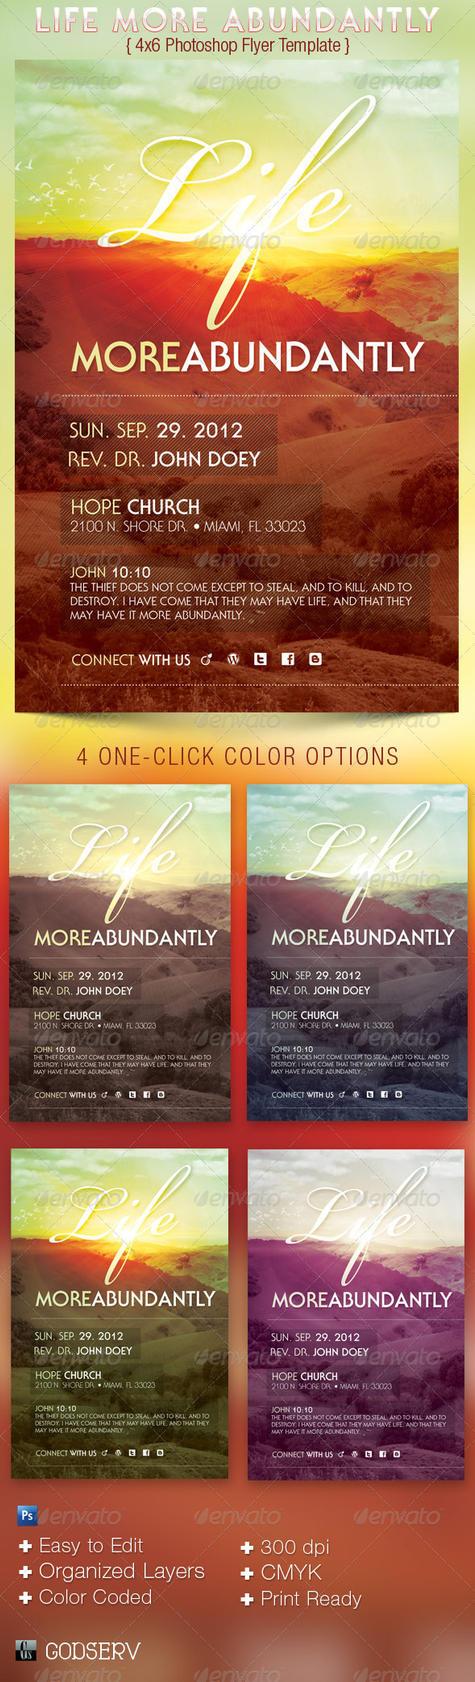 flyertemplates godserv 3 0 life more abundantly 4x6 church flyer